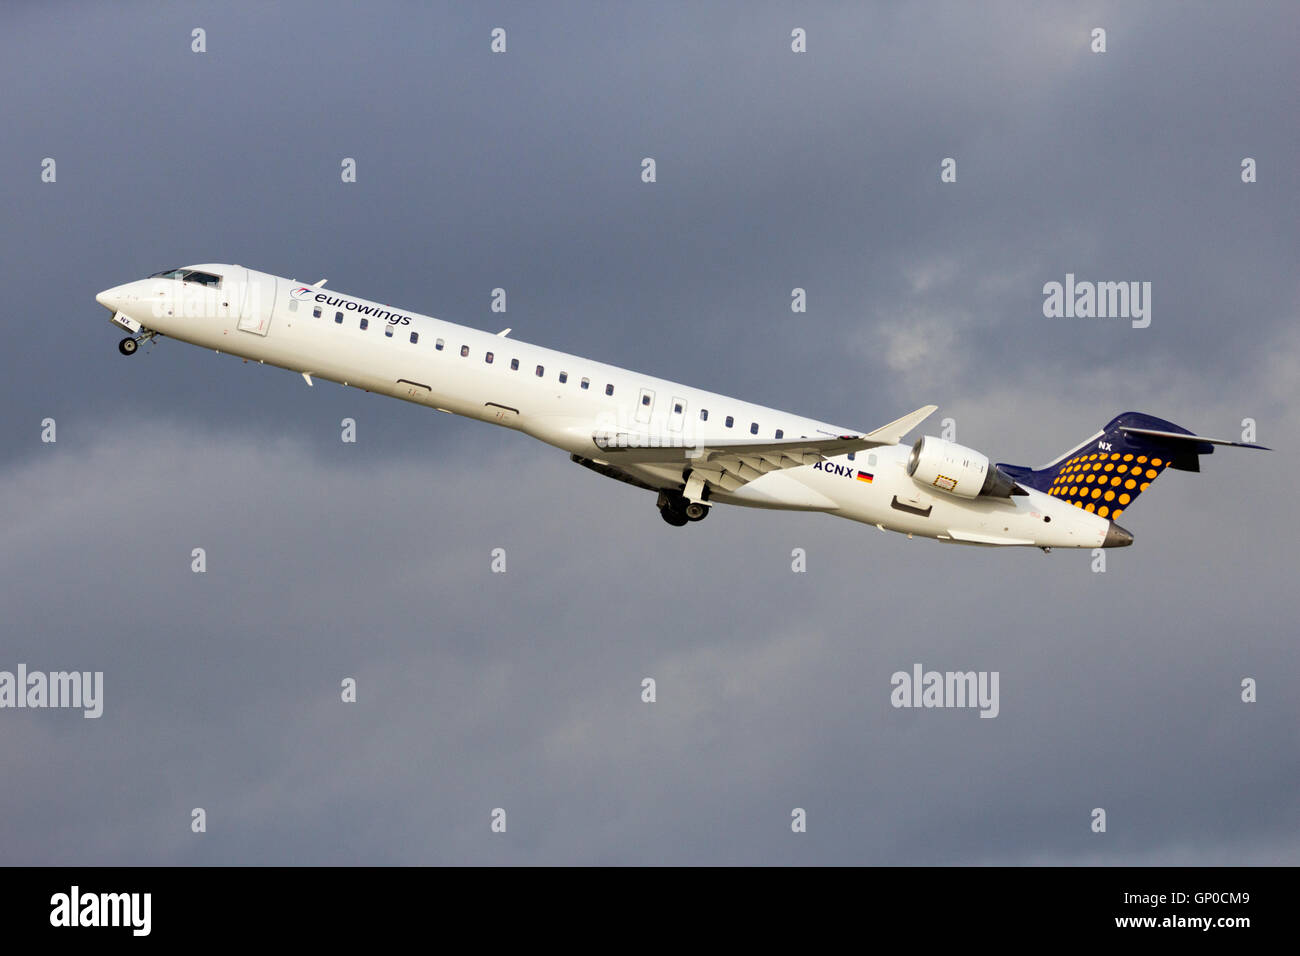 Eurowings Canadair CRJ-900LR take-off from Dusseldorf Airport. - Stock Image